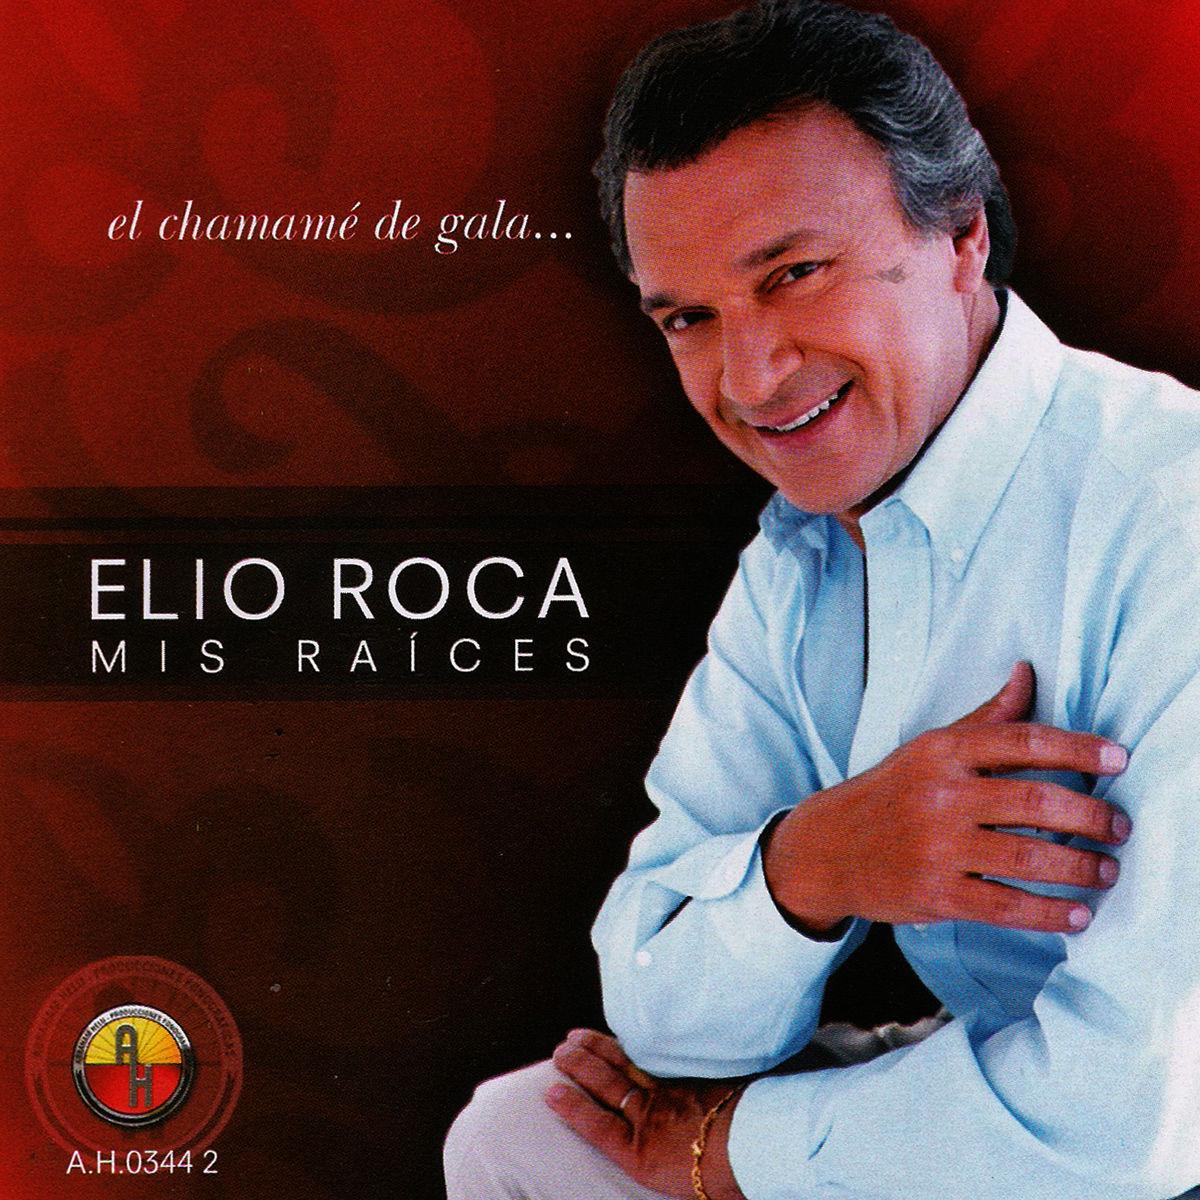 ELIO ROCA - MIS RAICES - 2008 - Omar Longhi